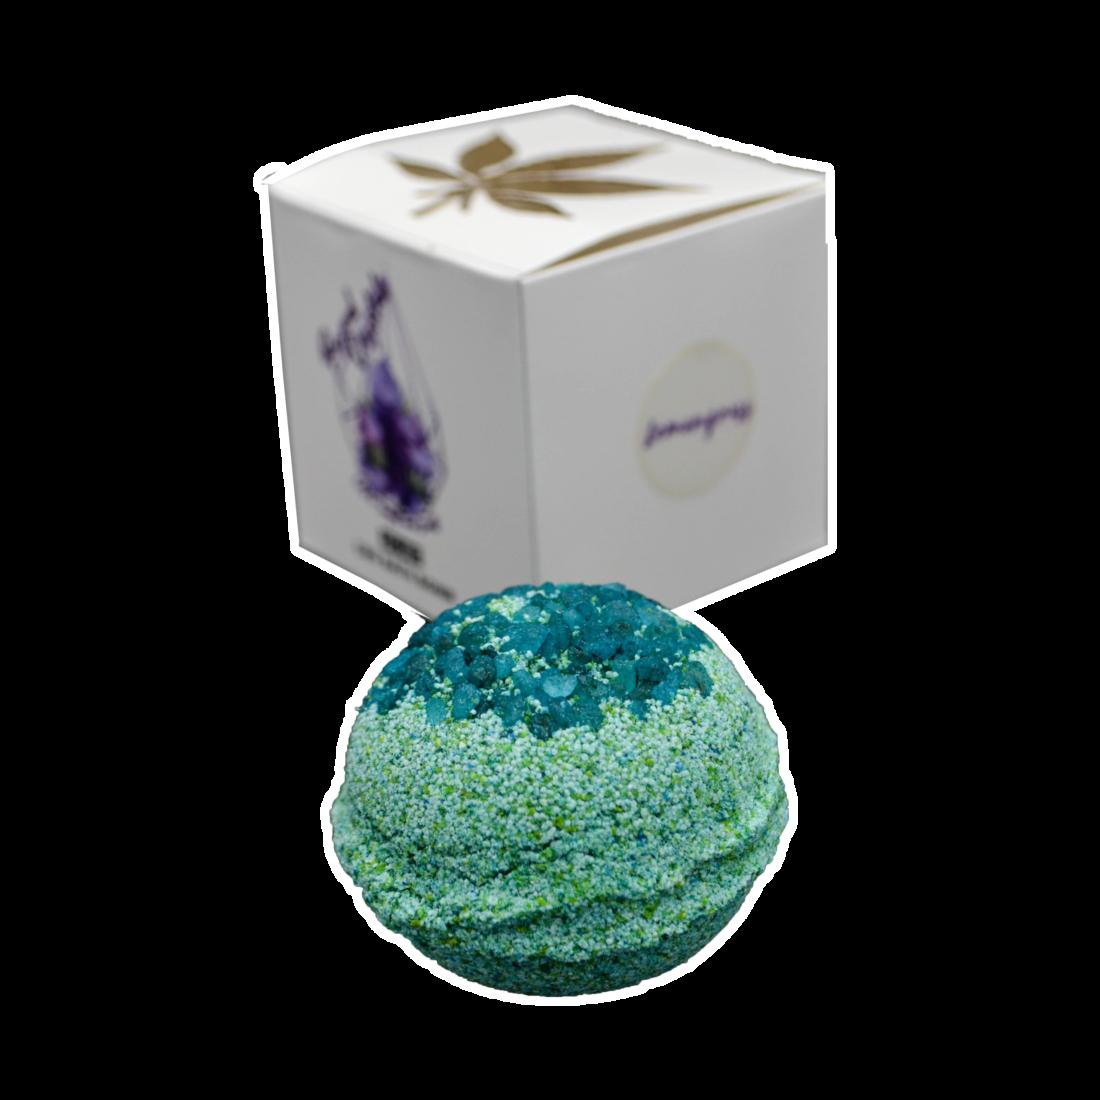 CBD Livity - Lemongrass bath bomb